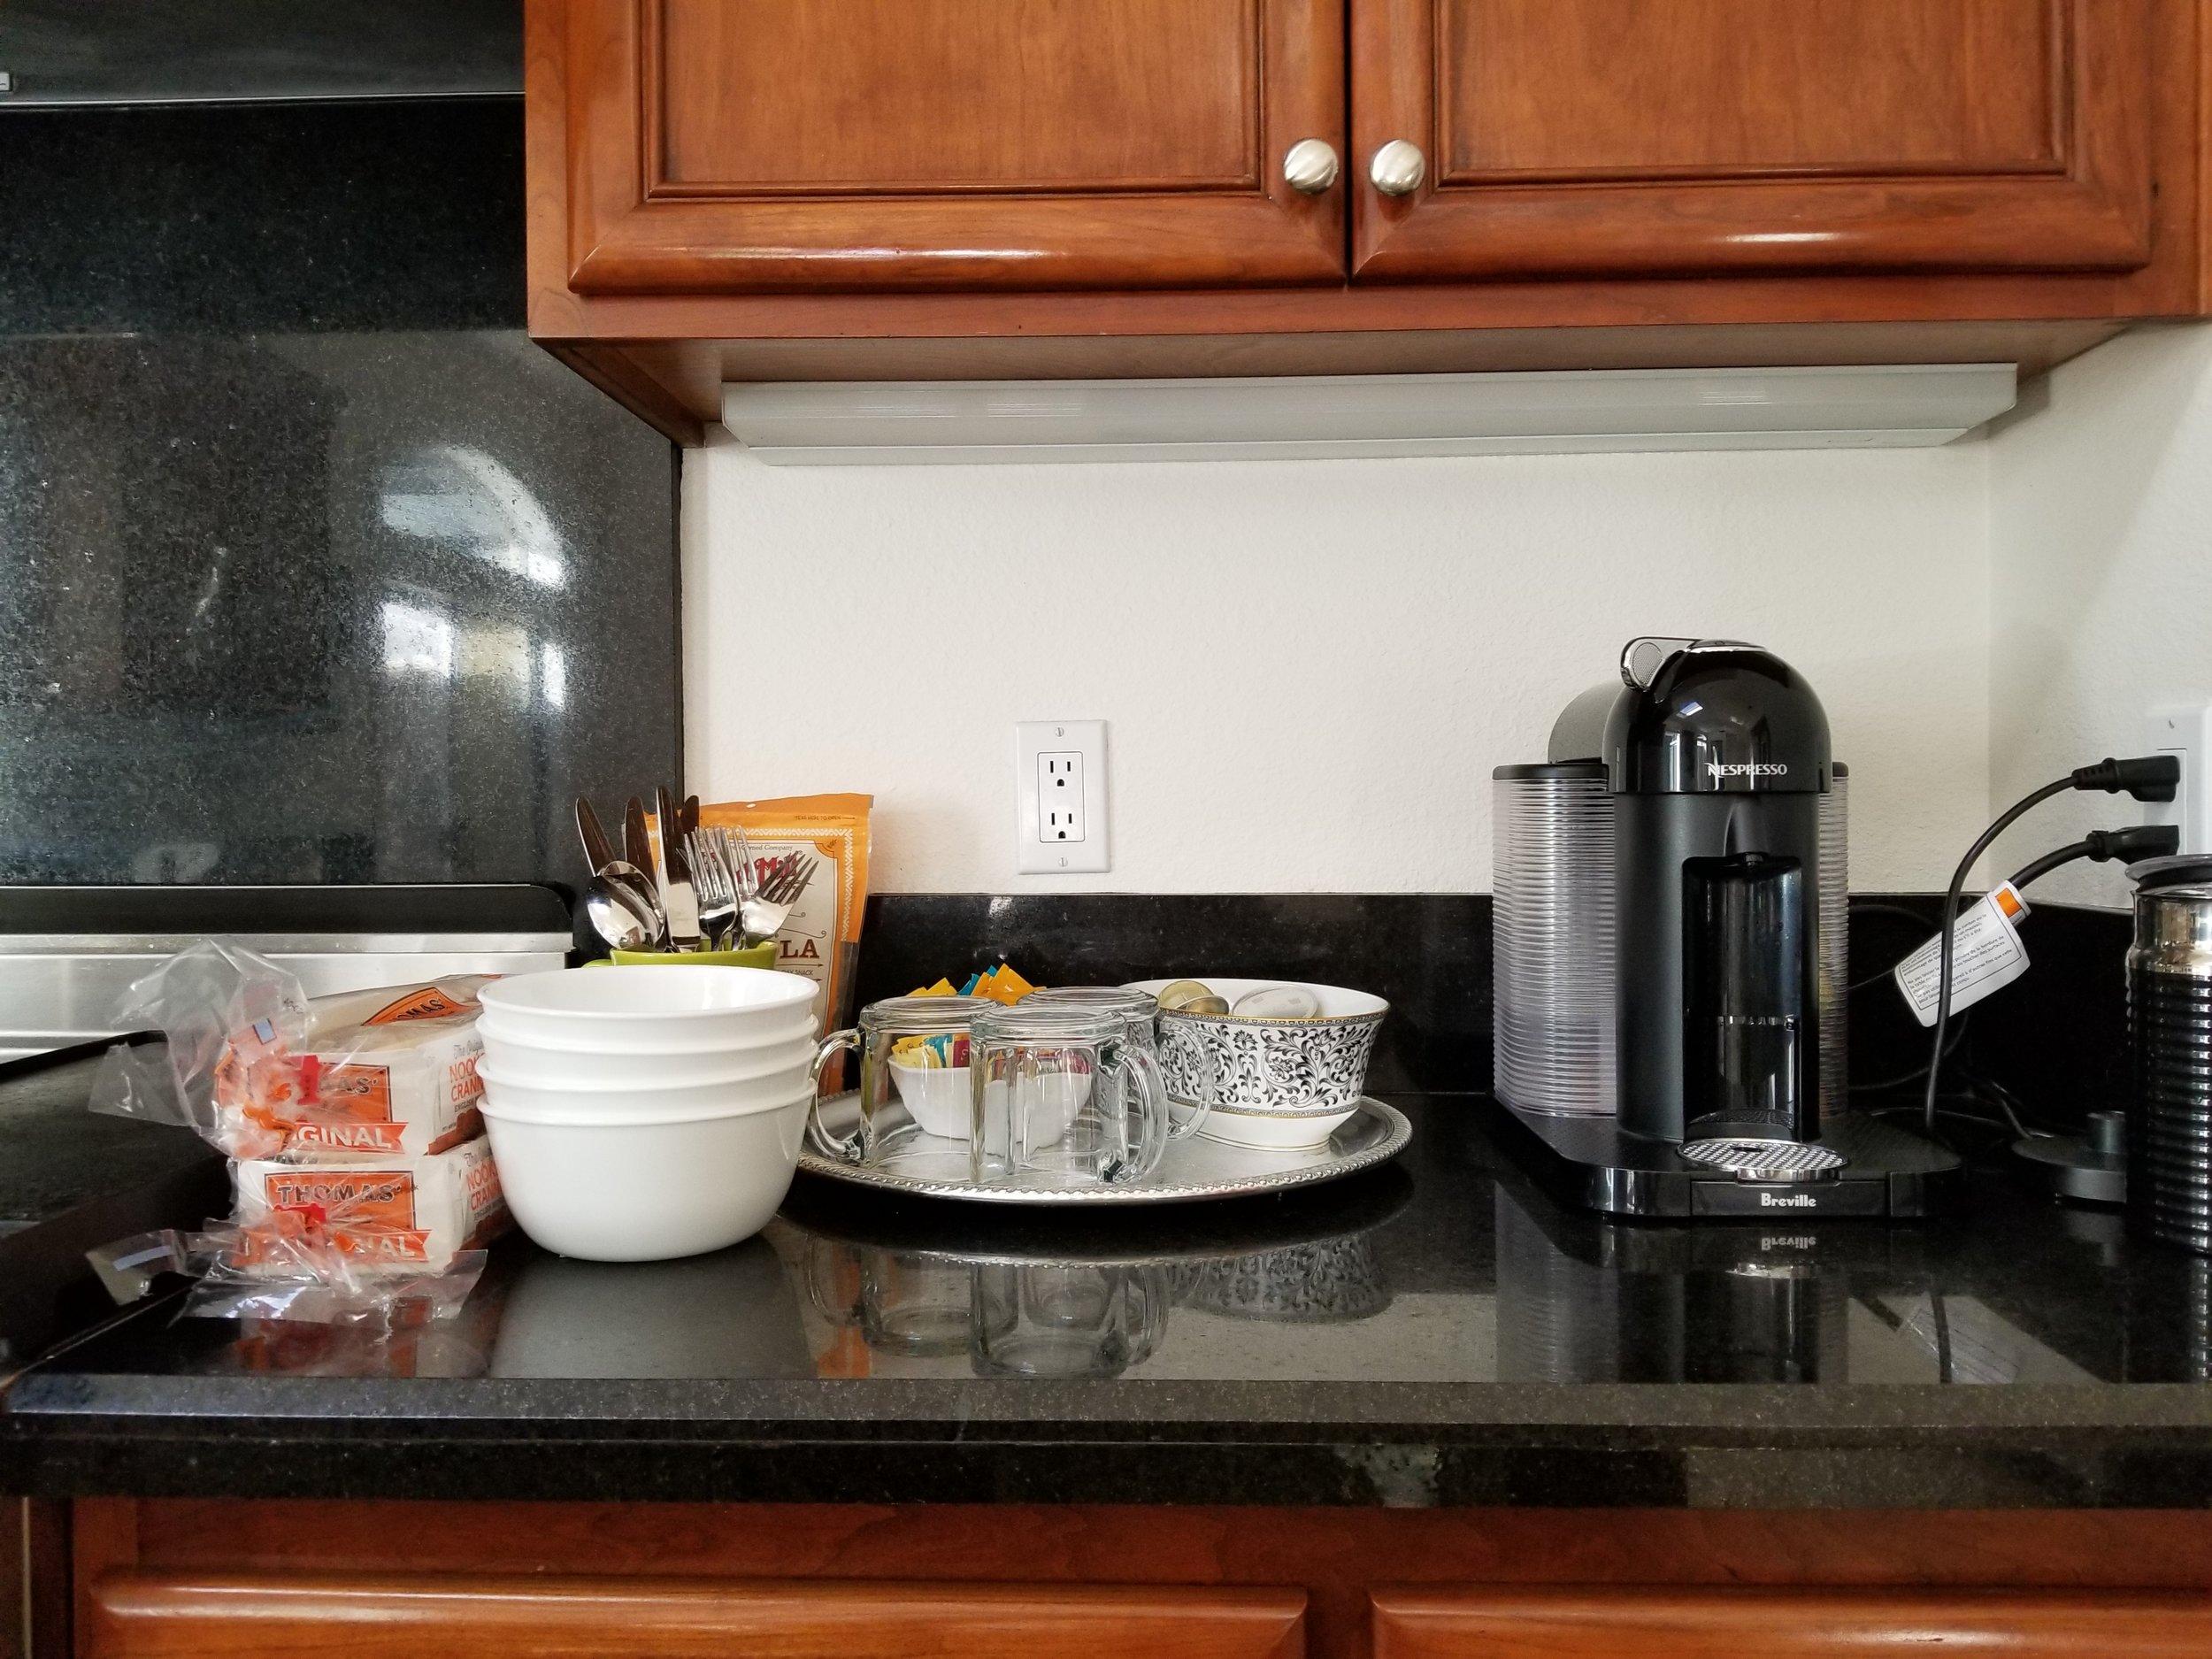 Breakfast awaits